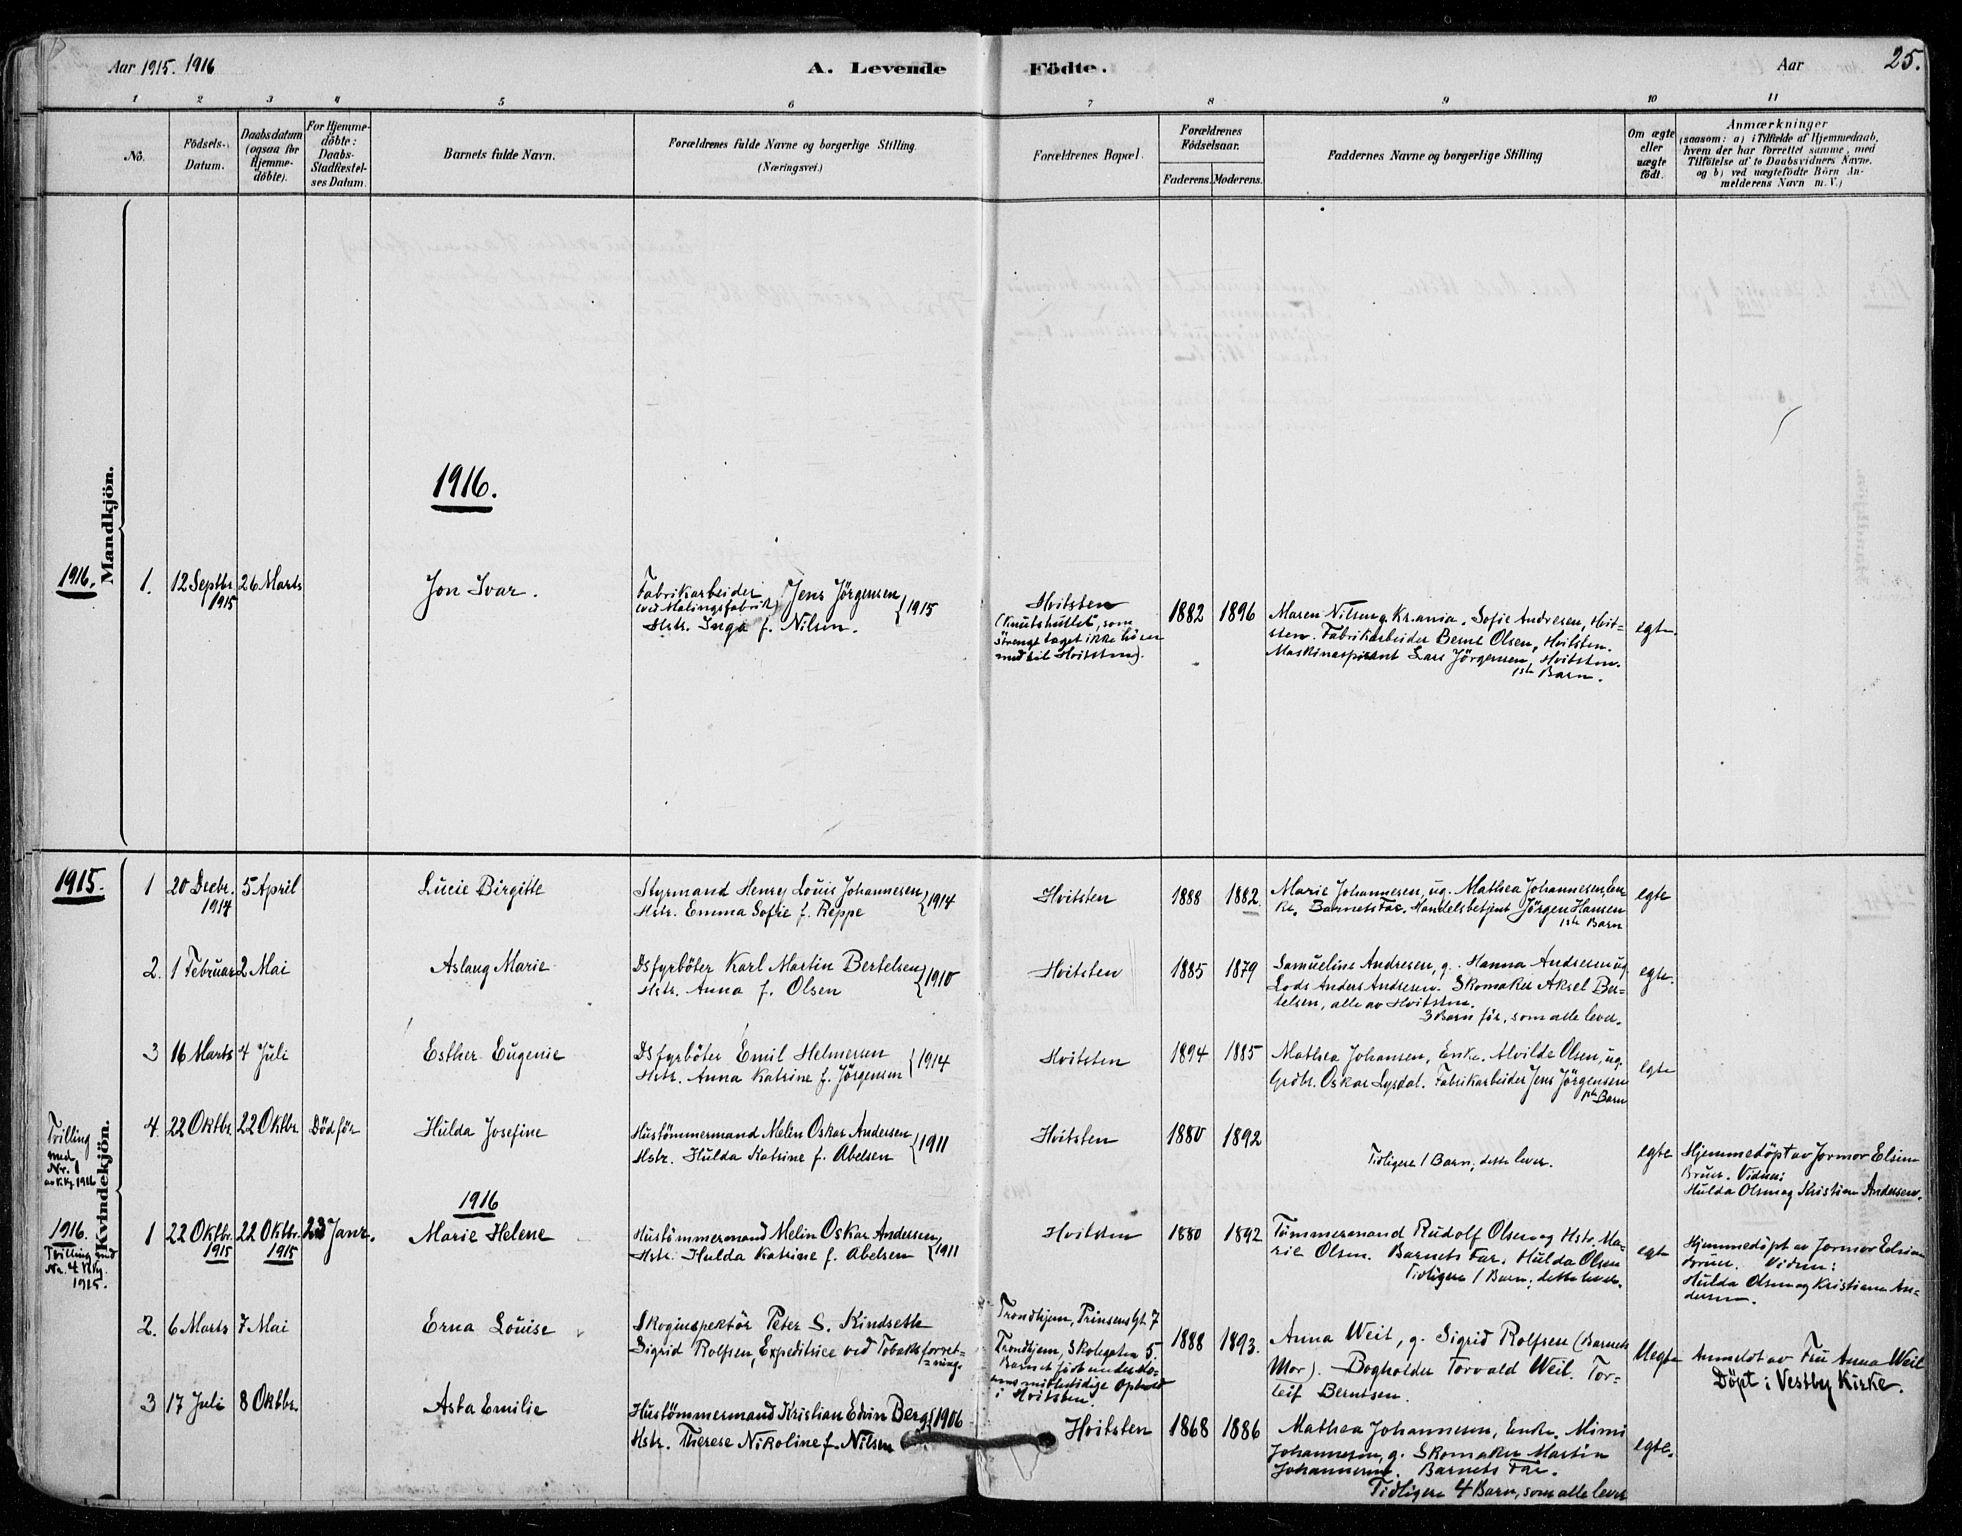 SAO, Vestby prestekontor Kirkebøker, F/Fd/L0001: Ministerialbok nr. IV 1, 1878-1945, s. 25